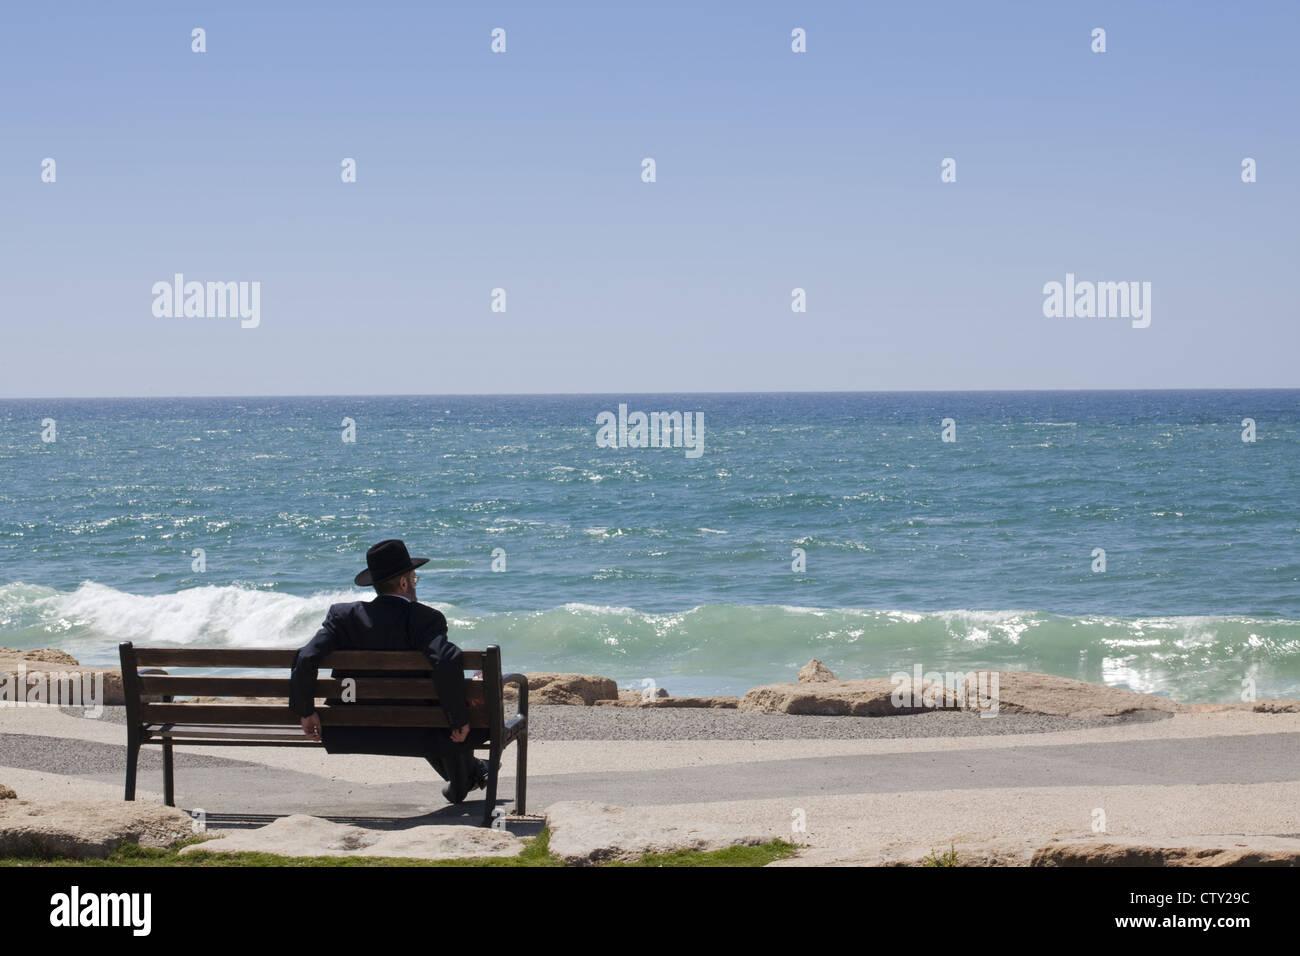 Beach scene along the seaside Shlomo Lahat Promenade in Tel Aviv, Israel - Stock Image